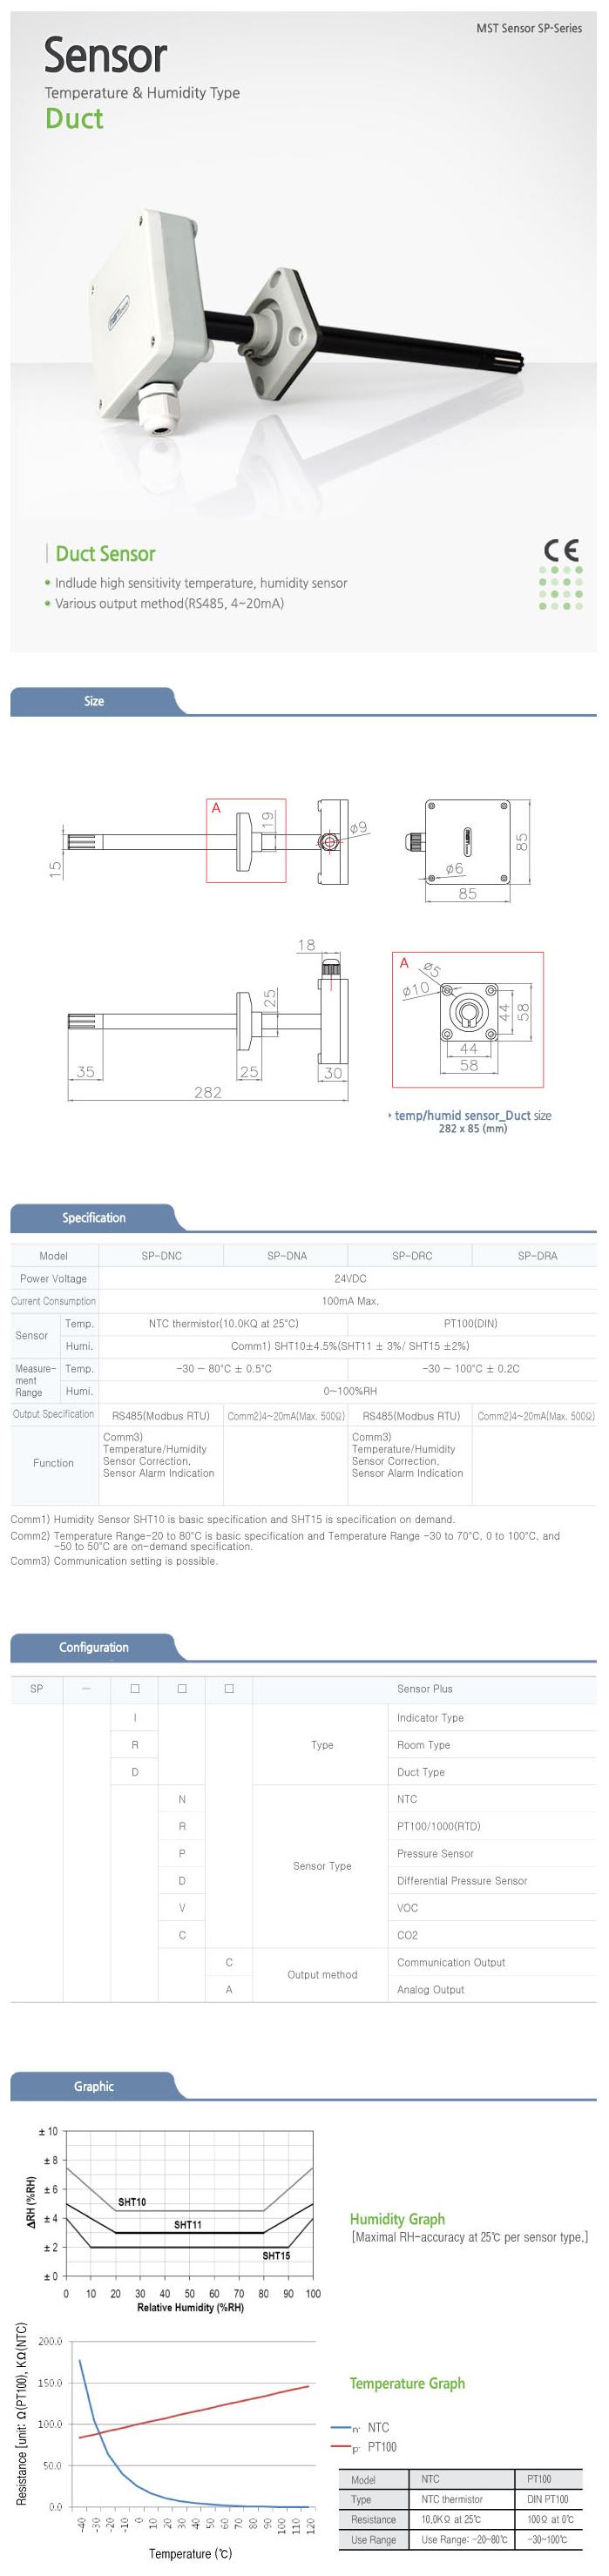 MST Temperature / Humidity Sensor (Duct) SP Series